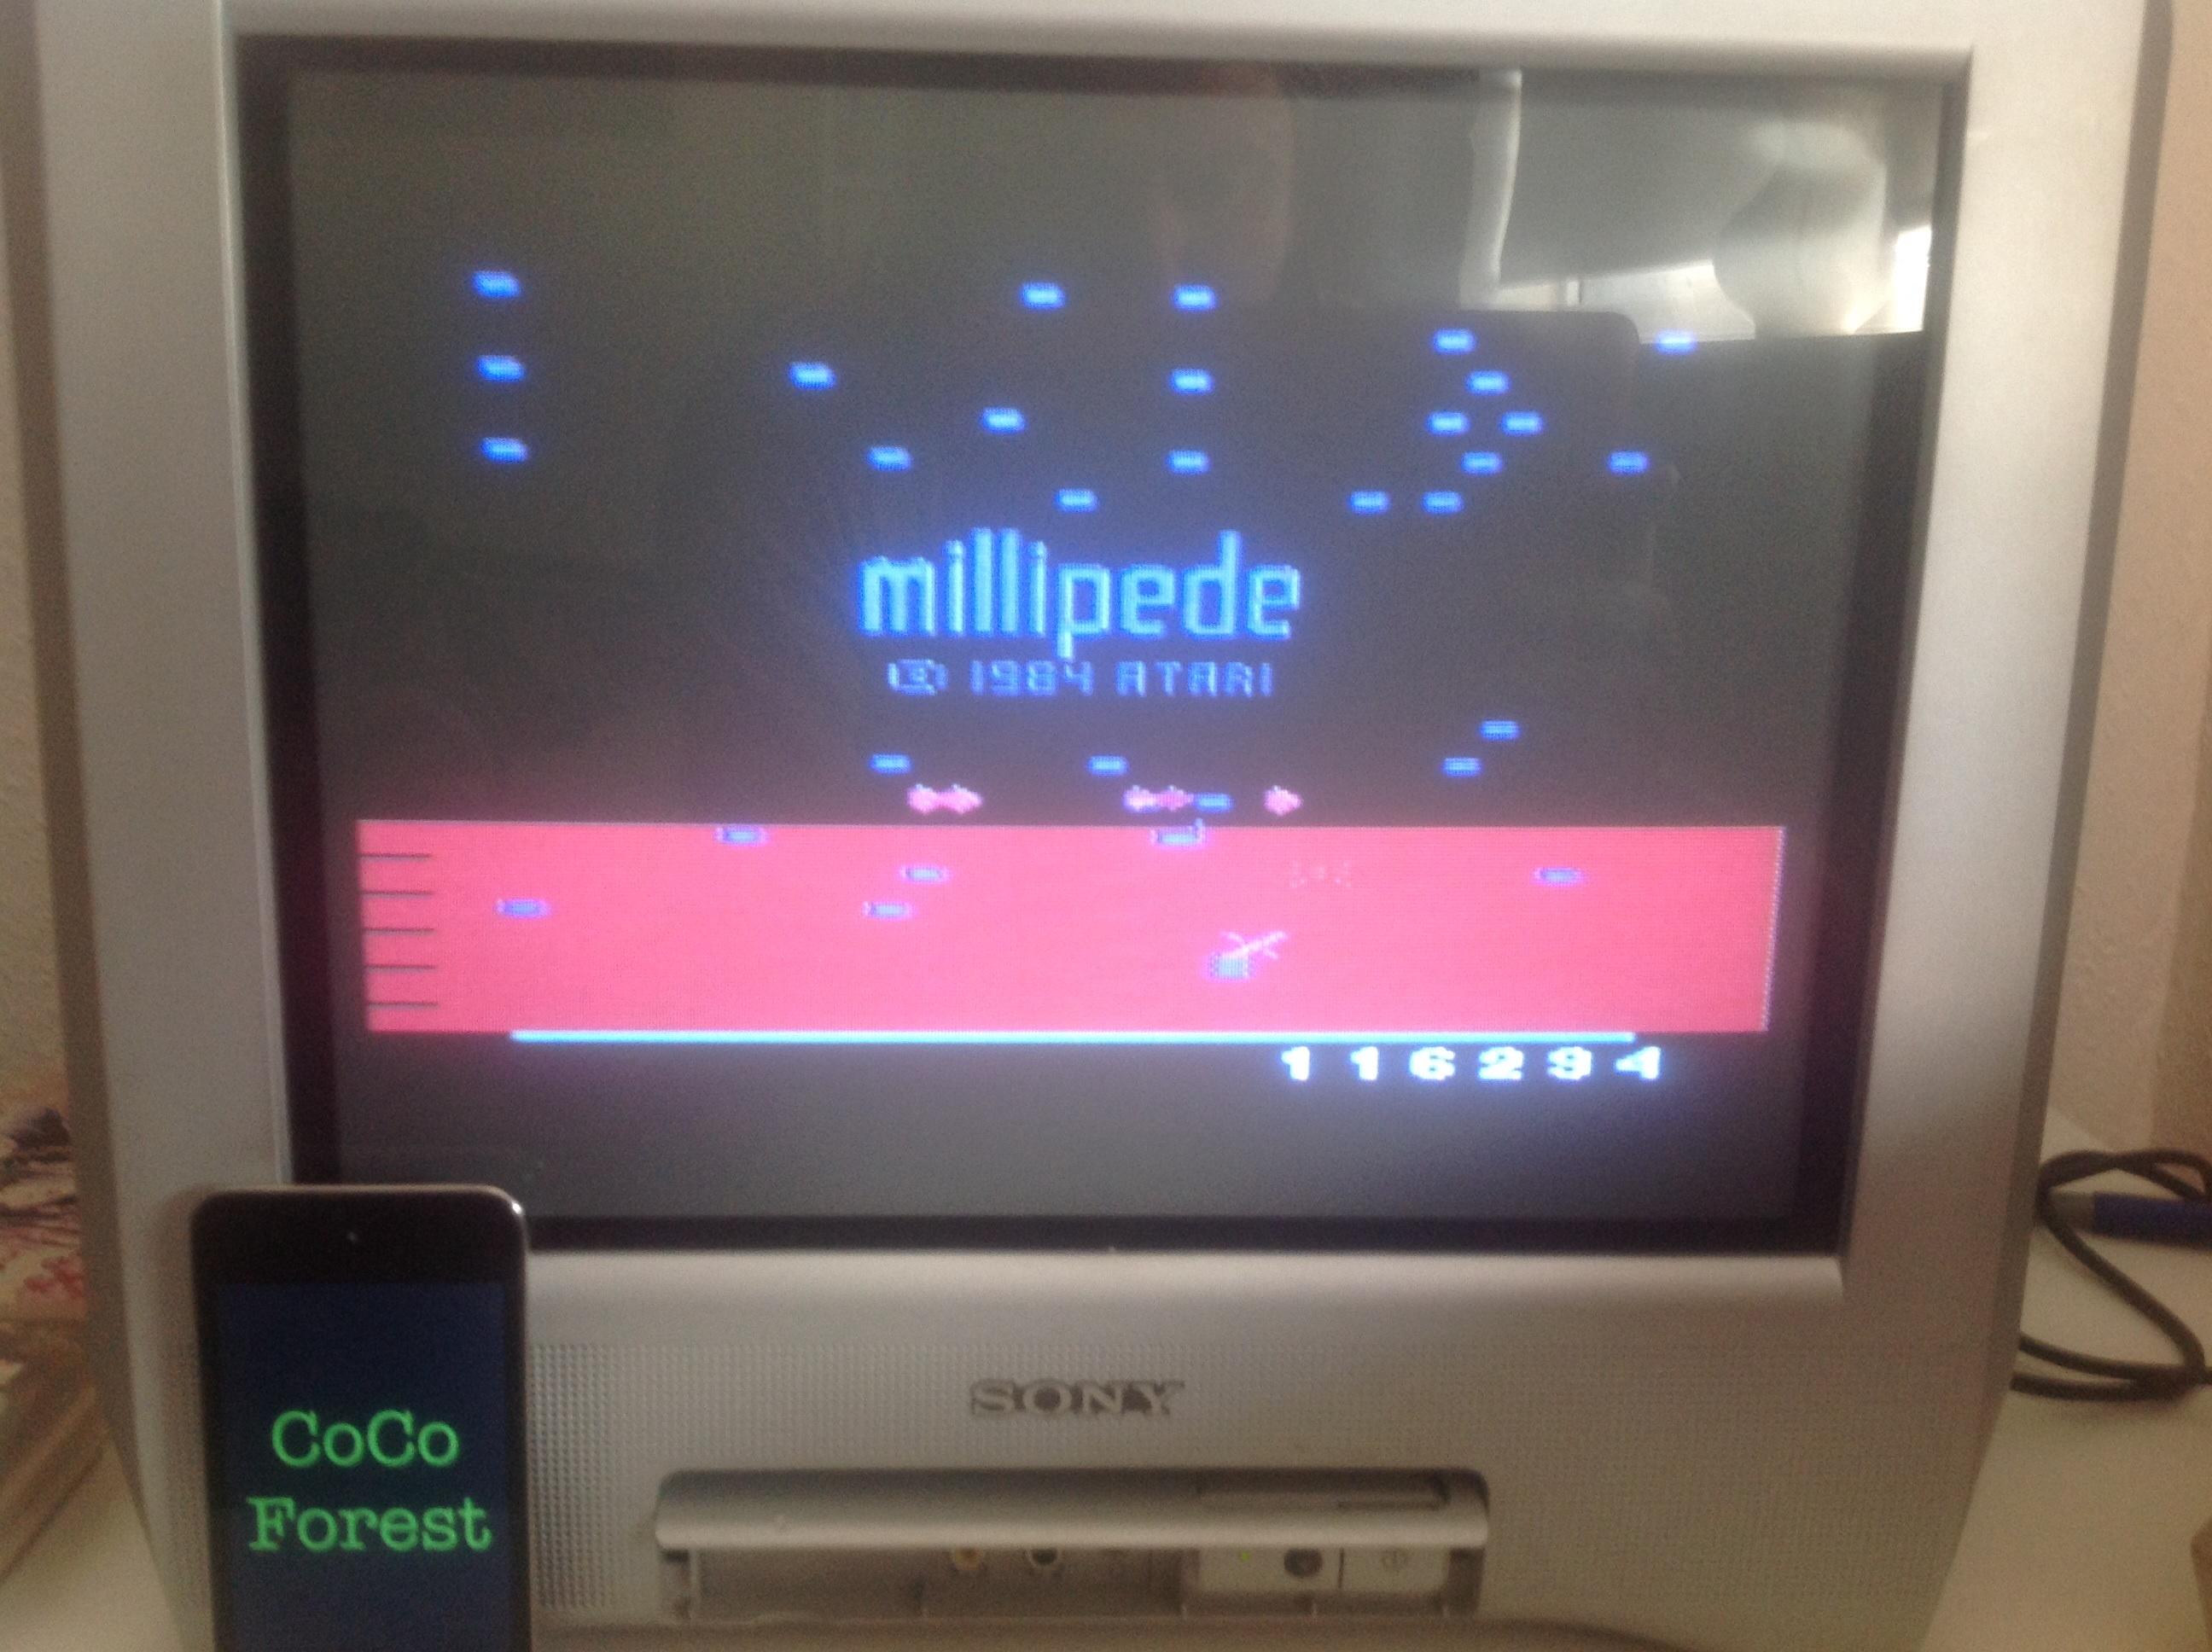 Millipede 116,294 points